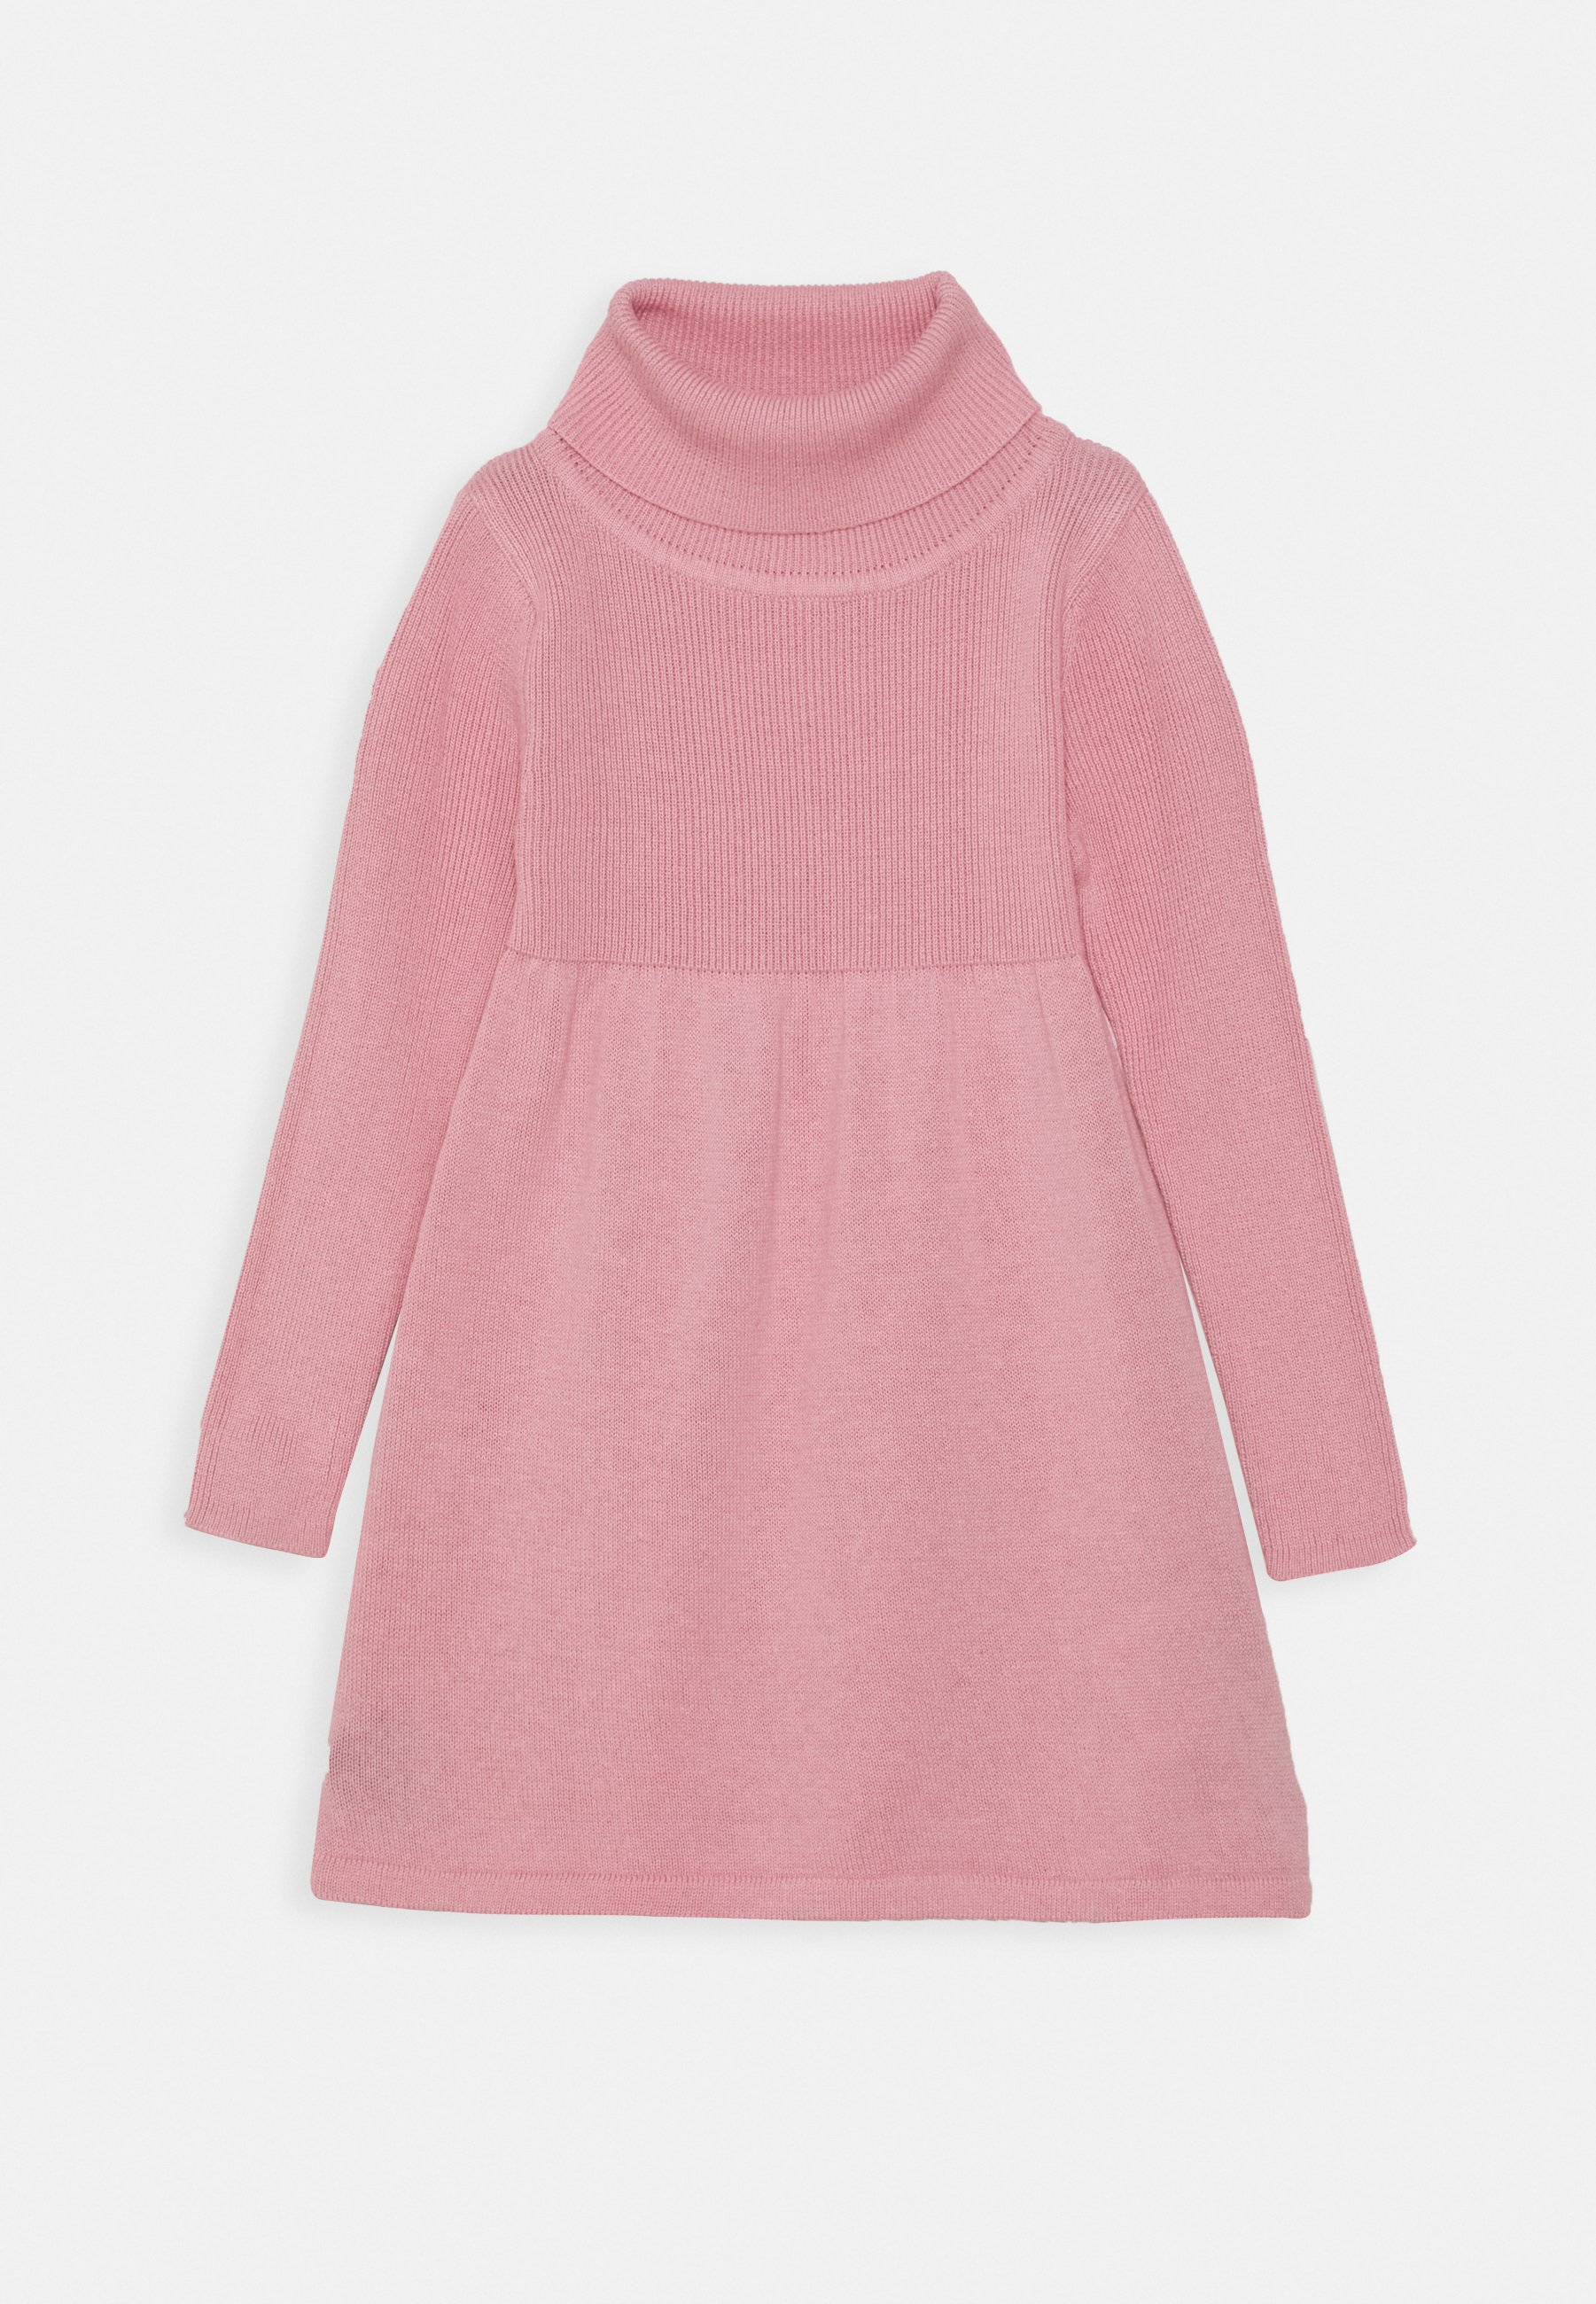 Kids KIDS ROLLNECK DRESS - Jumper dress